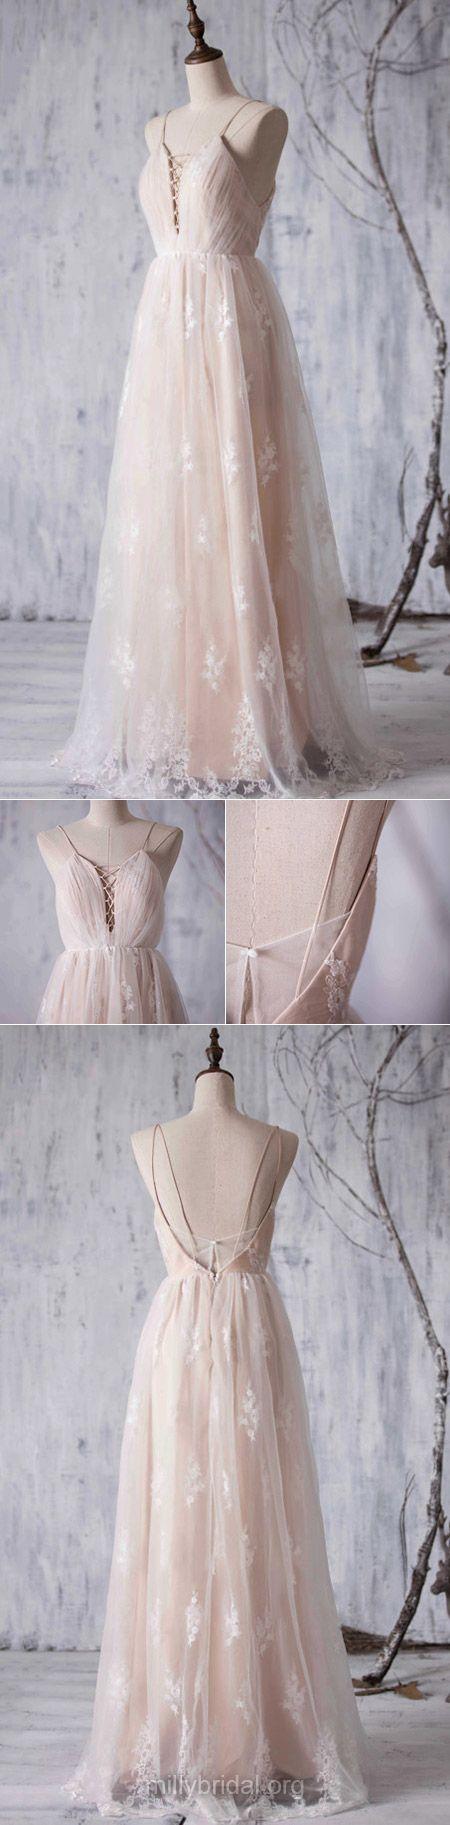 2018 Bridesmaid Dresses Long, Champagne Bridesmaid Dresses A-line, V-neck Bridesmaid Dresses Lace, Tulle Appliques Bridesmaid Dresses Backless Fashion